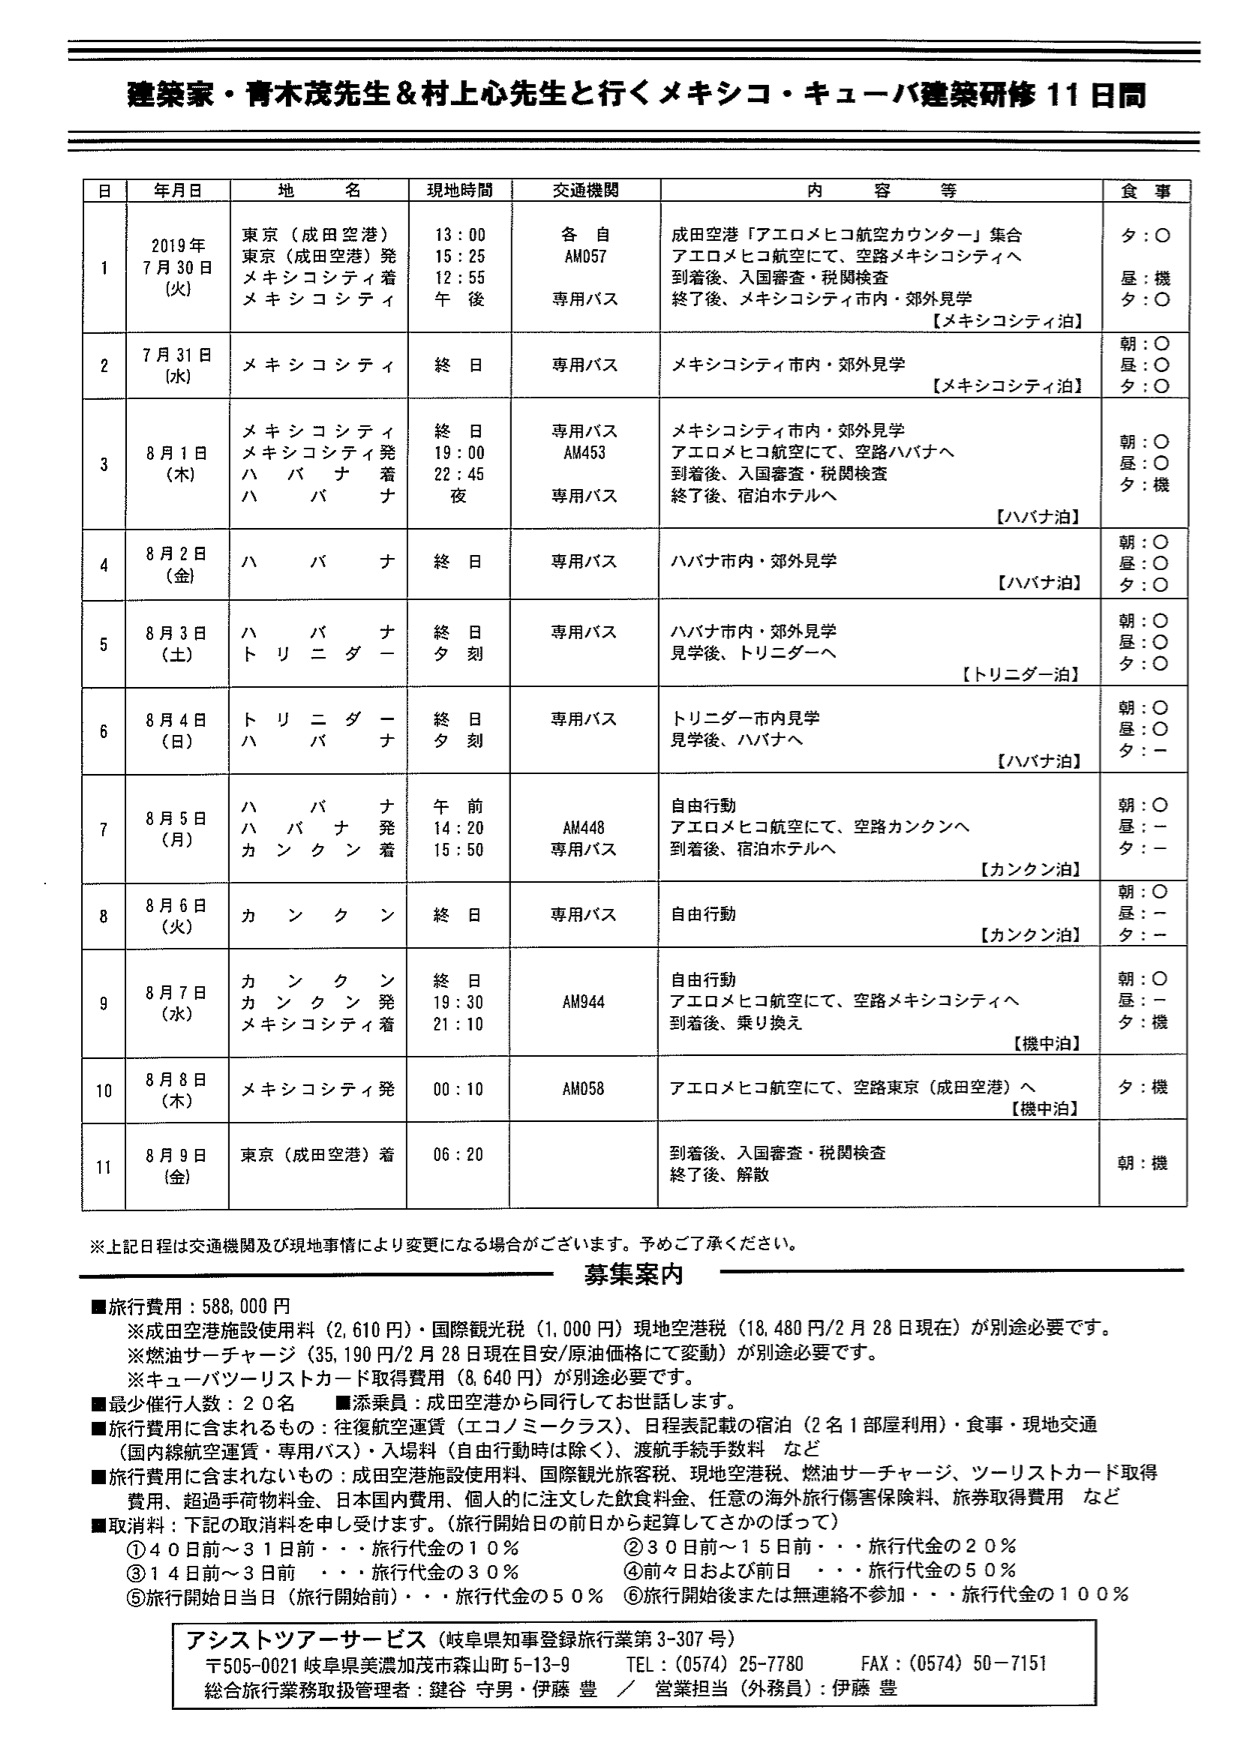 http://aokou.jp/news/images/%E3%83%A1%E3%82%AD%E3%82%B7%E3%82%B3.jpg